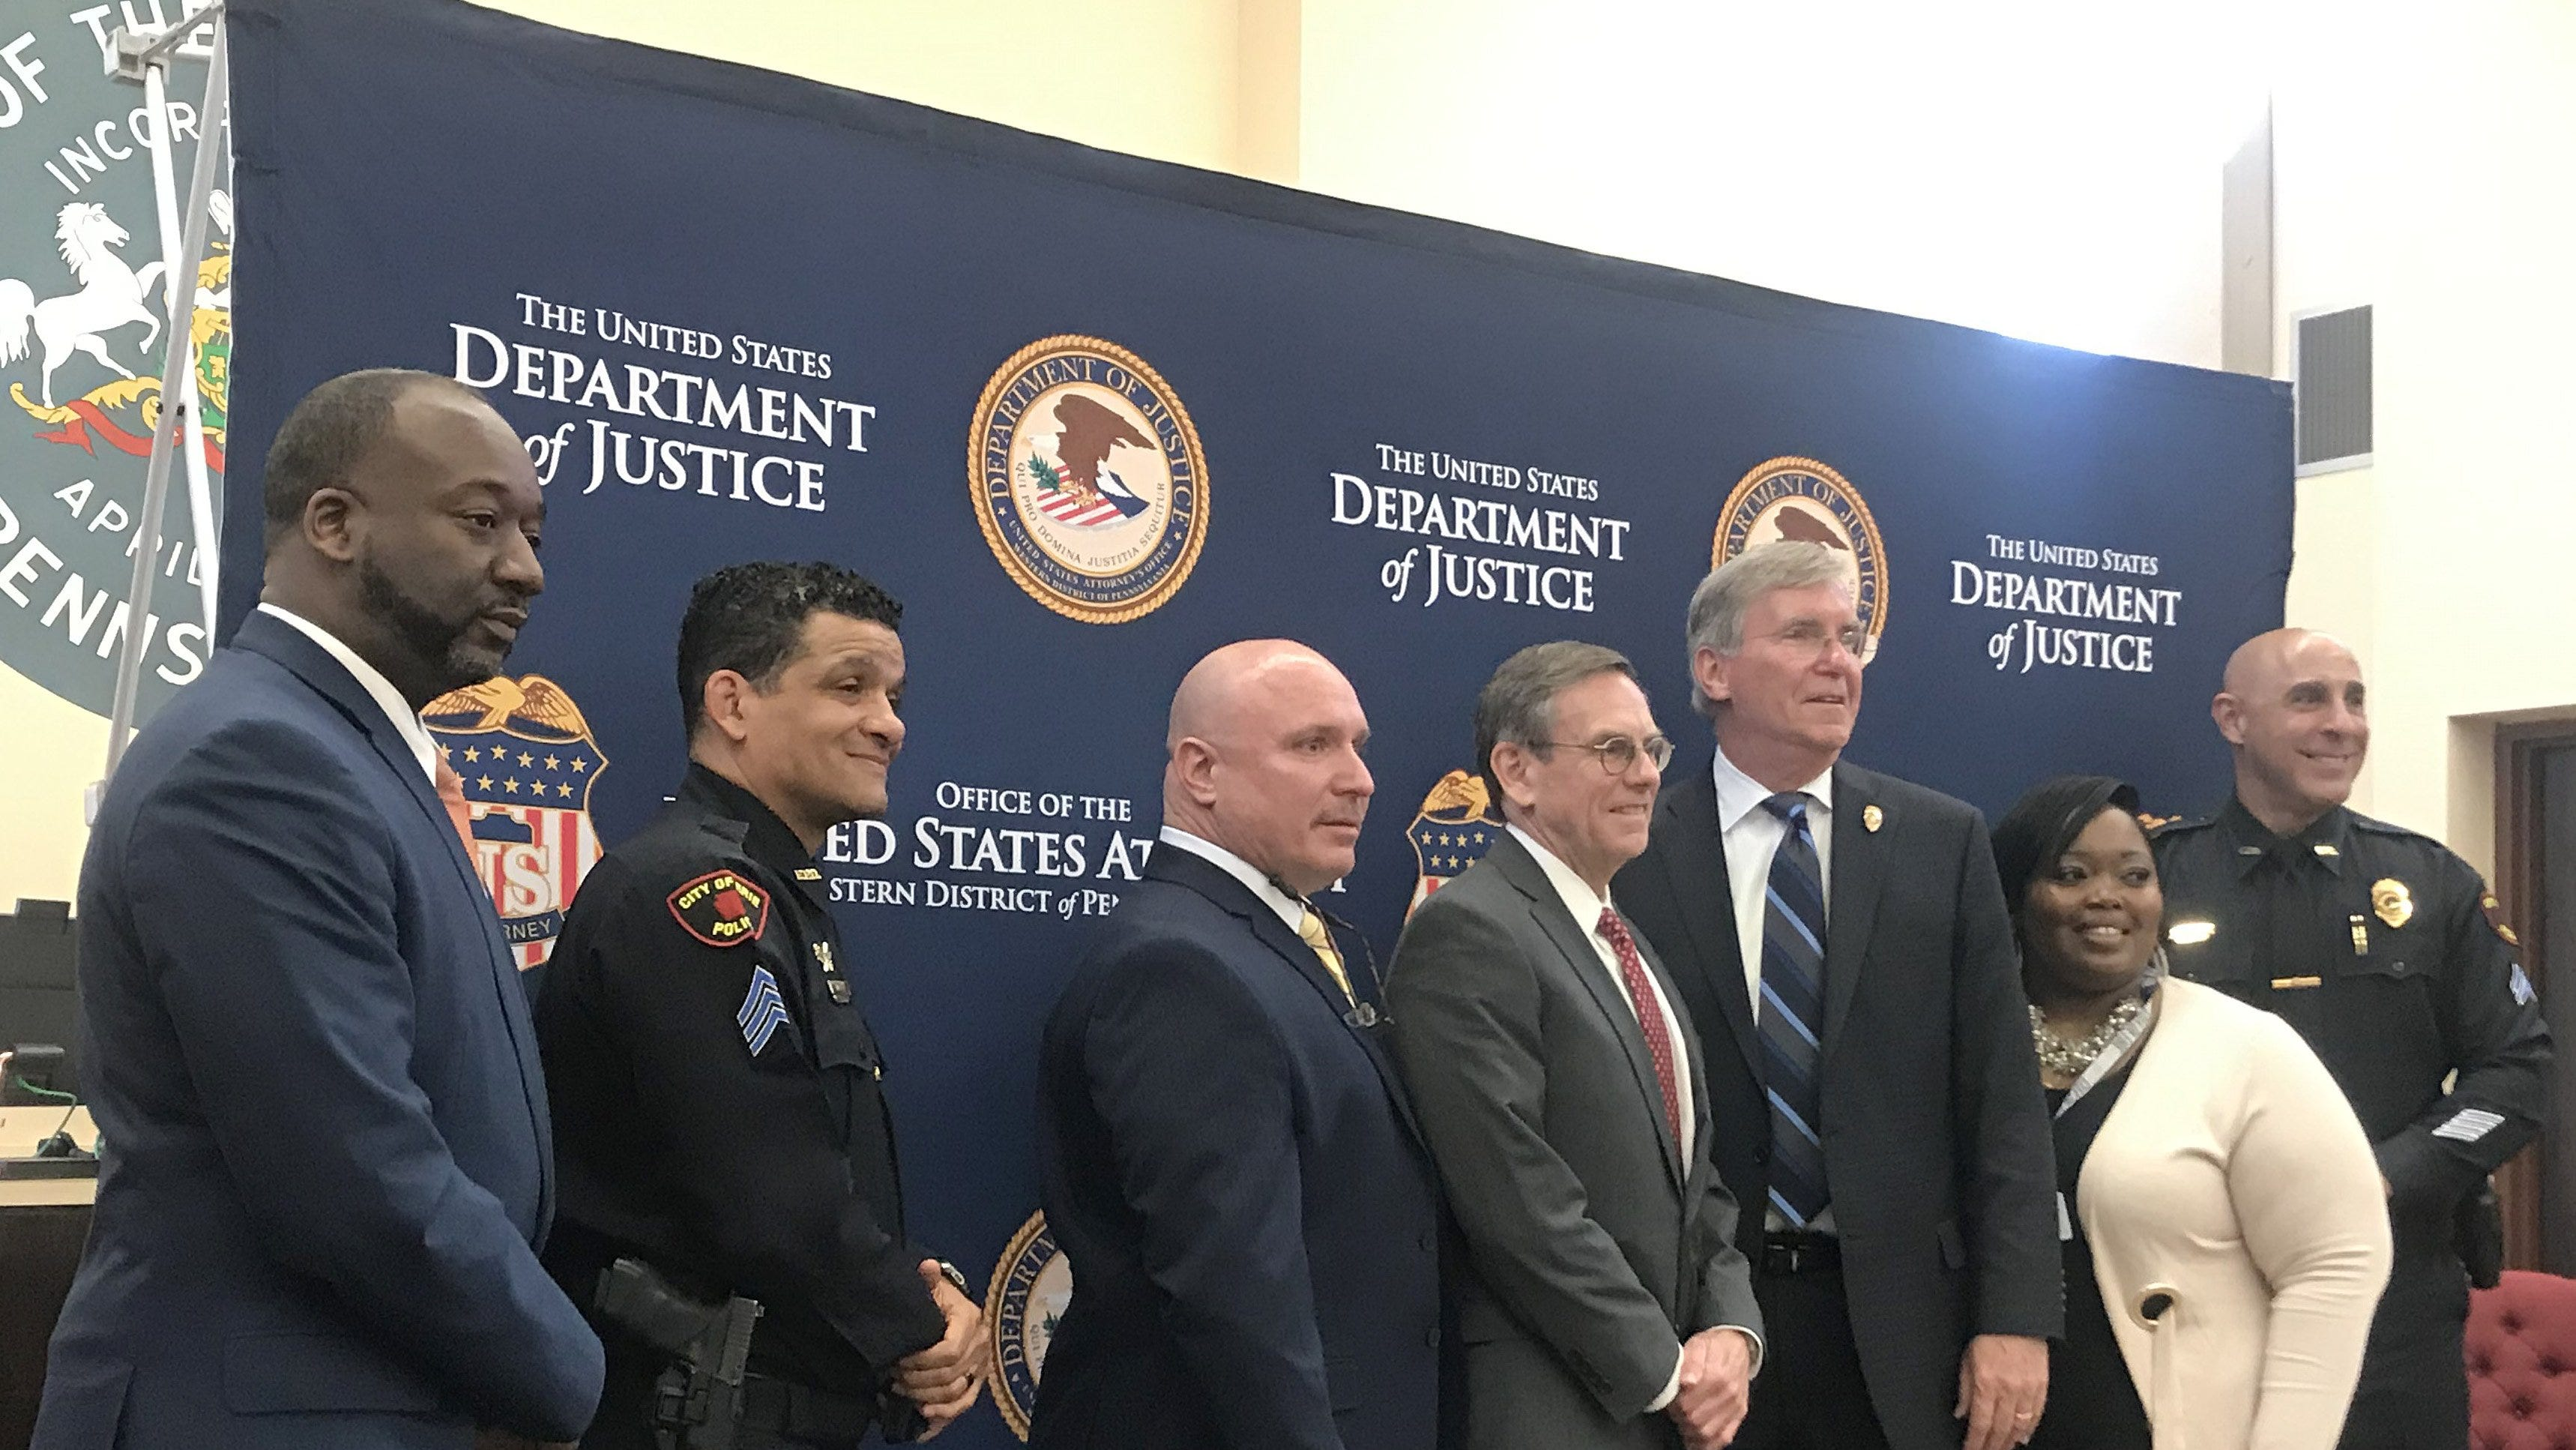 Police diversity key to rebuilding trust, reforming criminal justice